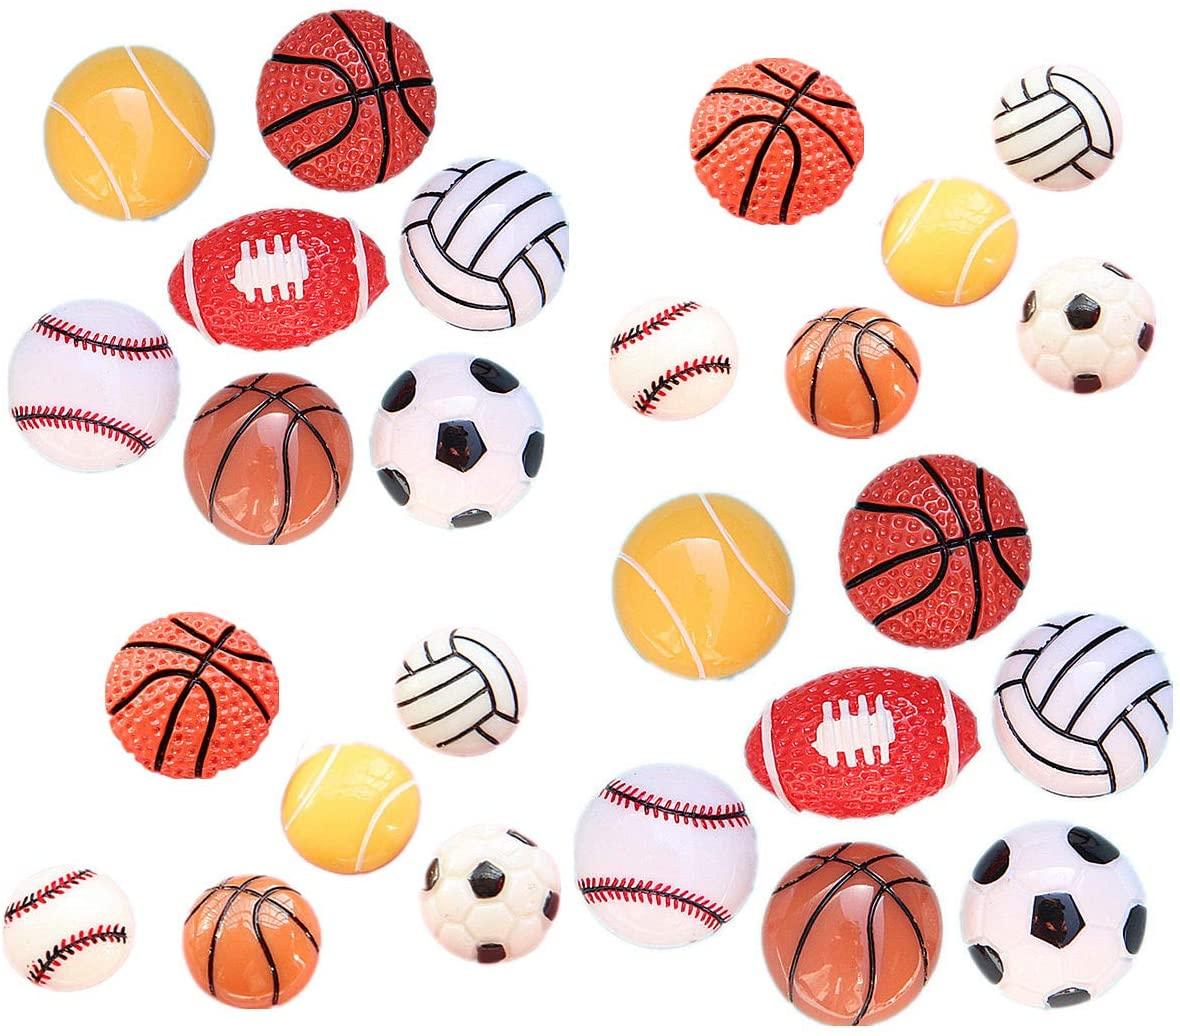 26Pack Assorted Sport Ball Charms Basketball Football Tennis Baseball Volleyball Resin Flatback Beads for Craft Making Miniature Fairy Garden Accessories Scrapbooking Phone Case DIY